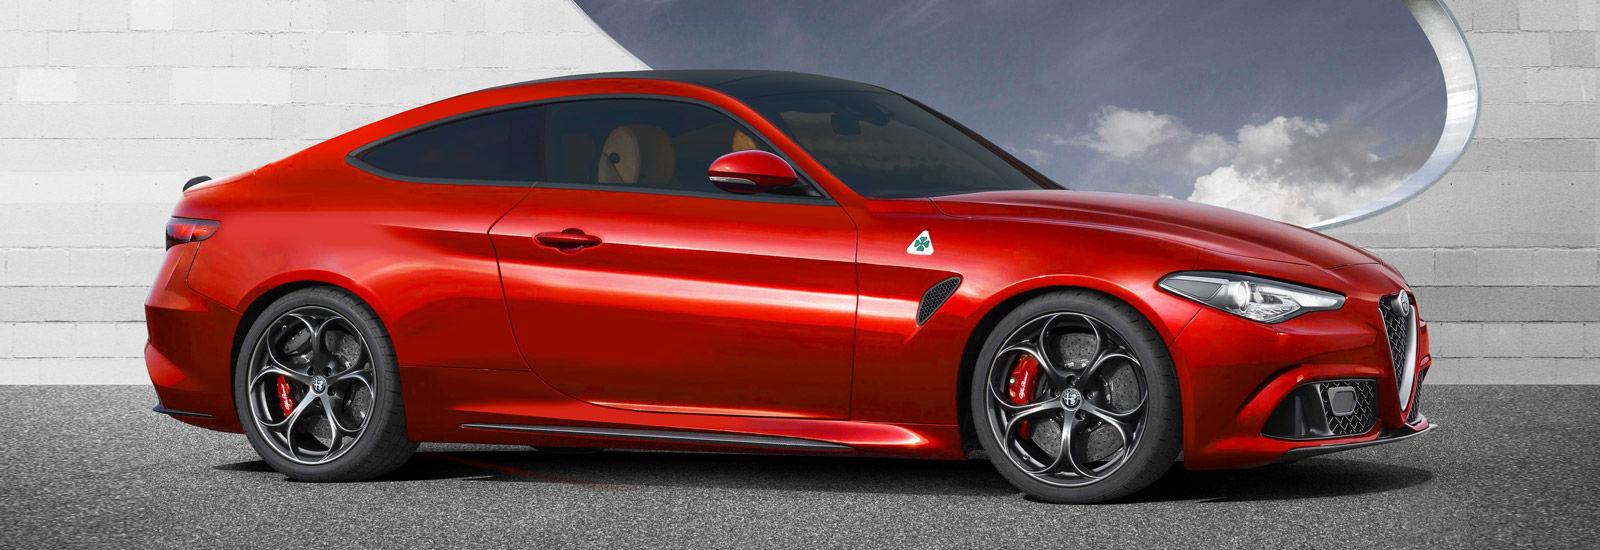 Alfa Romeo Giulia Coup La Proposta Concreta